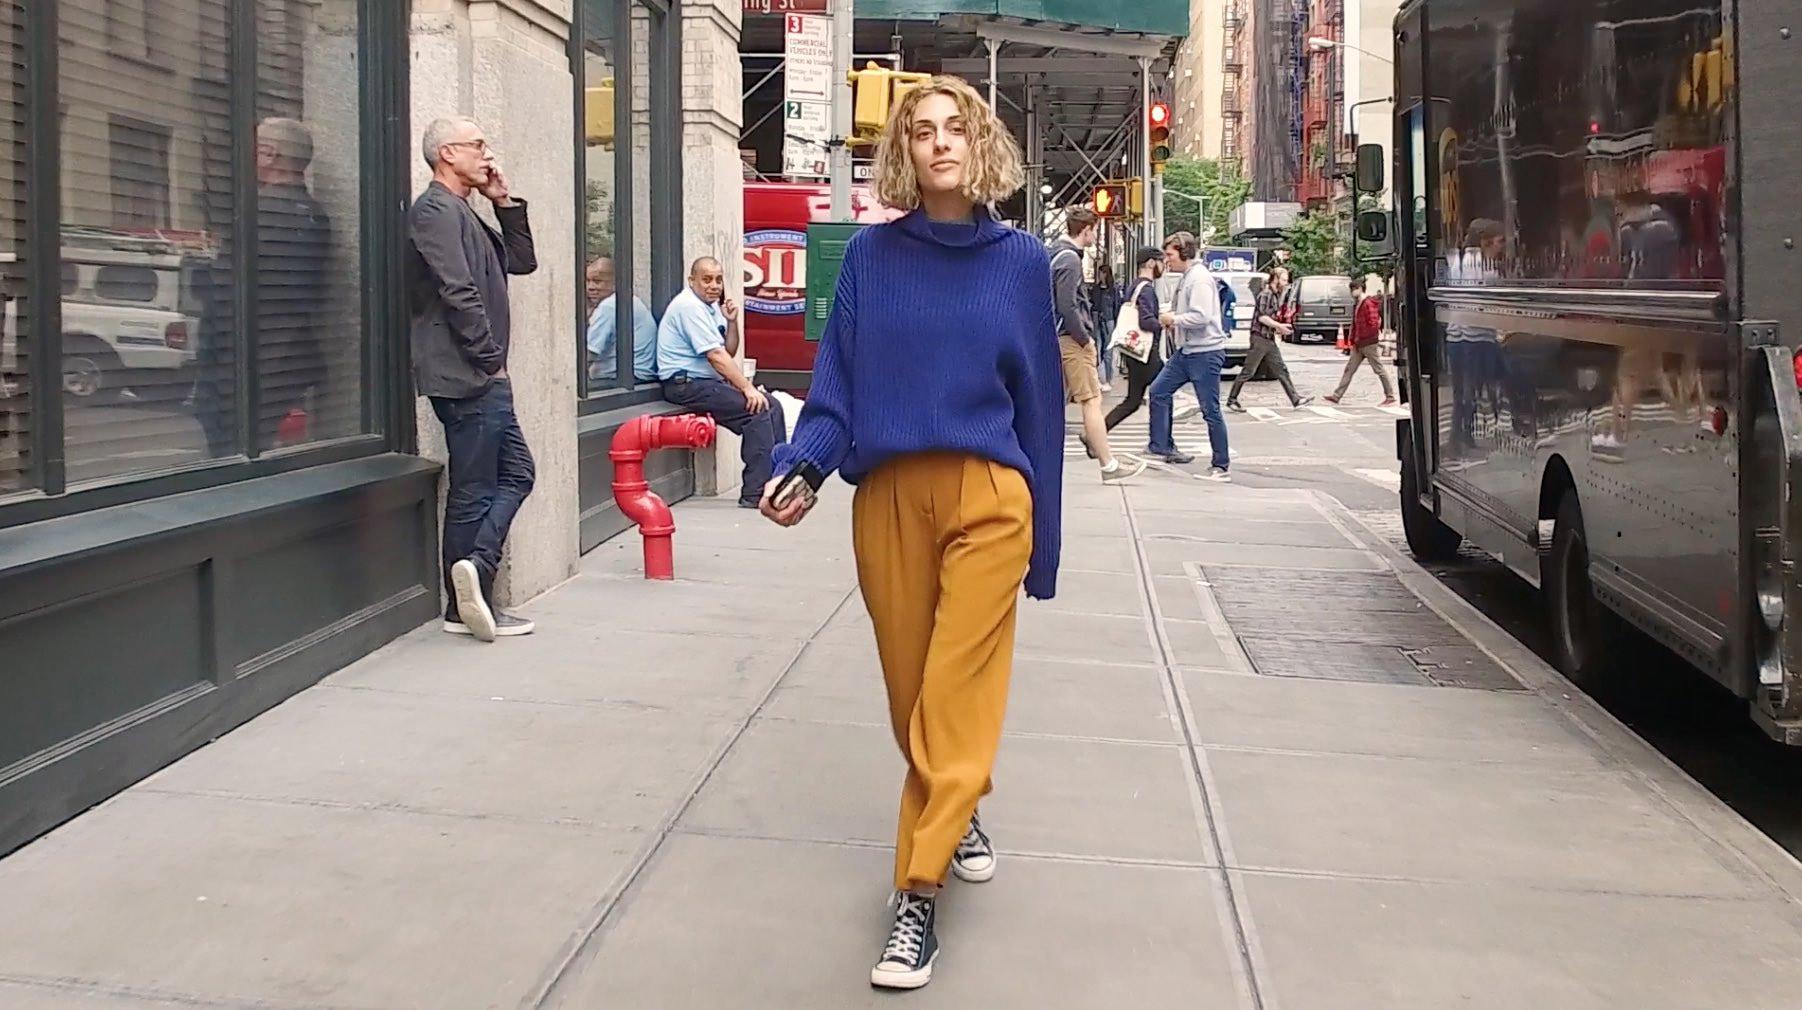 【NY】シンプルスタイルも配色チェンジで見違える!